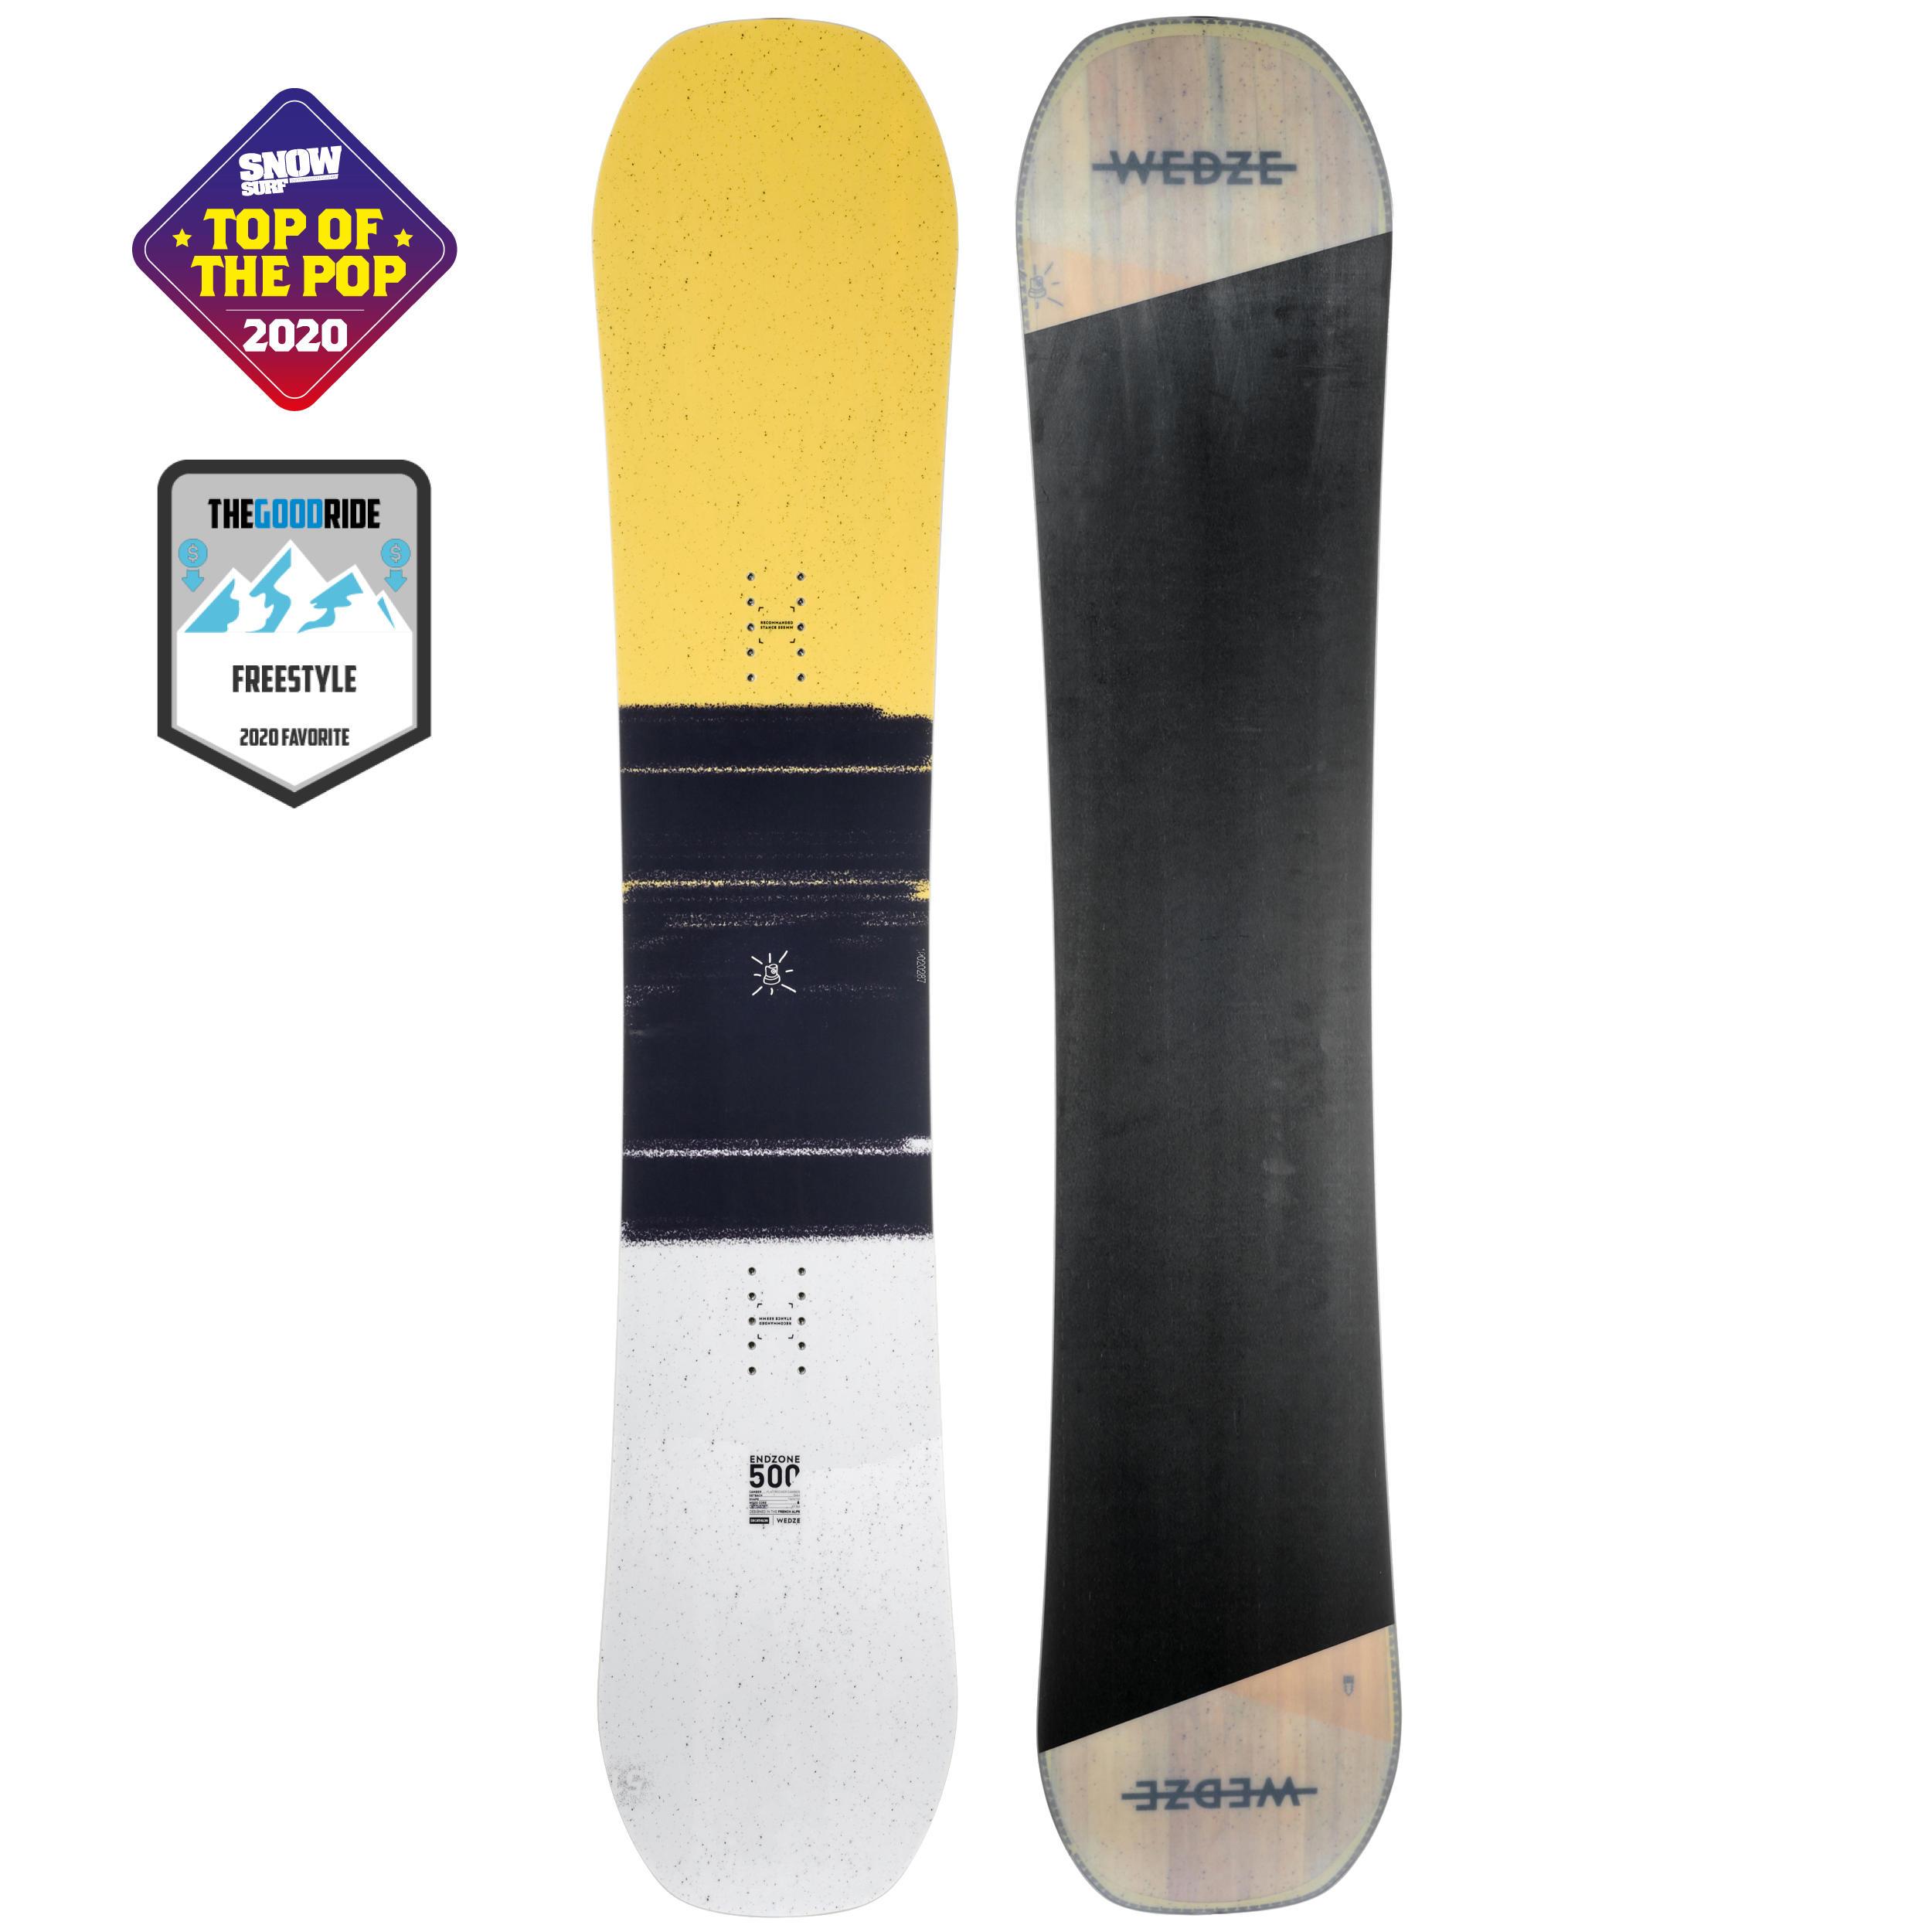 Snowboard Endzone 500 imagine